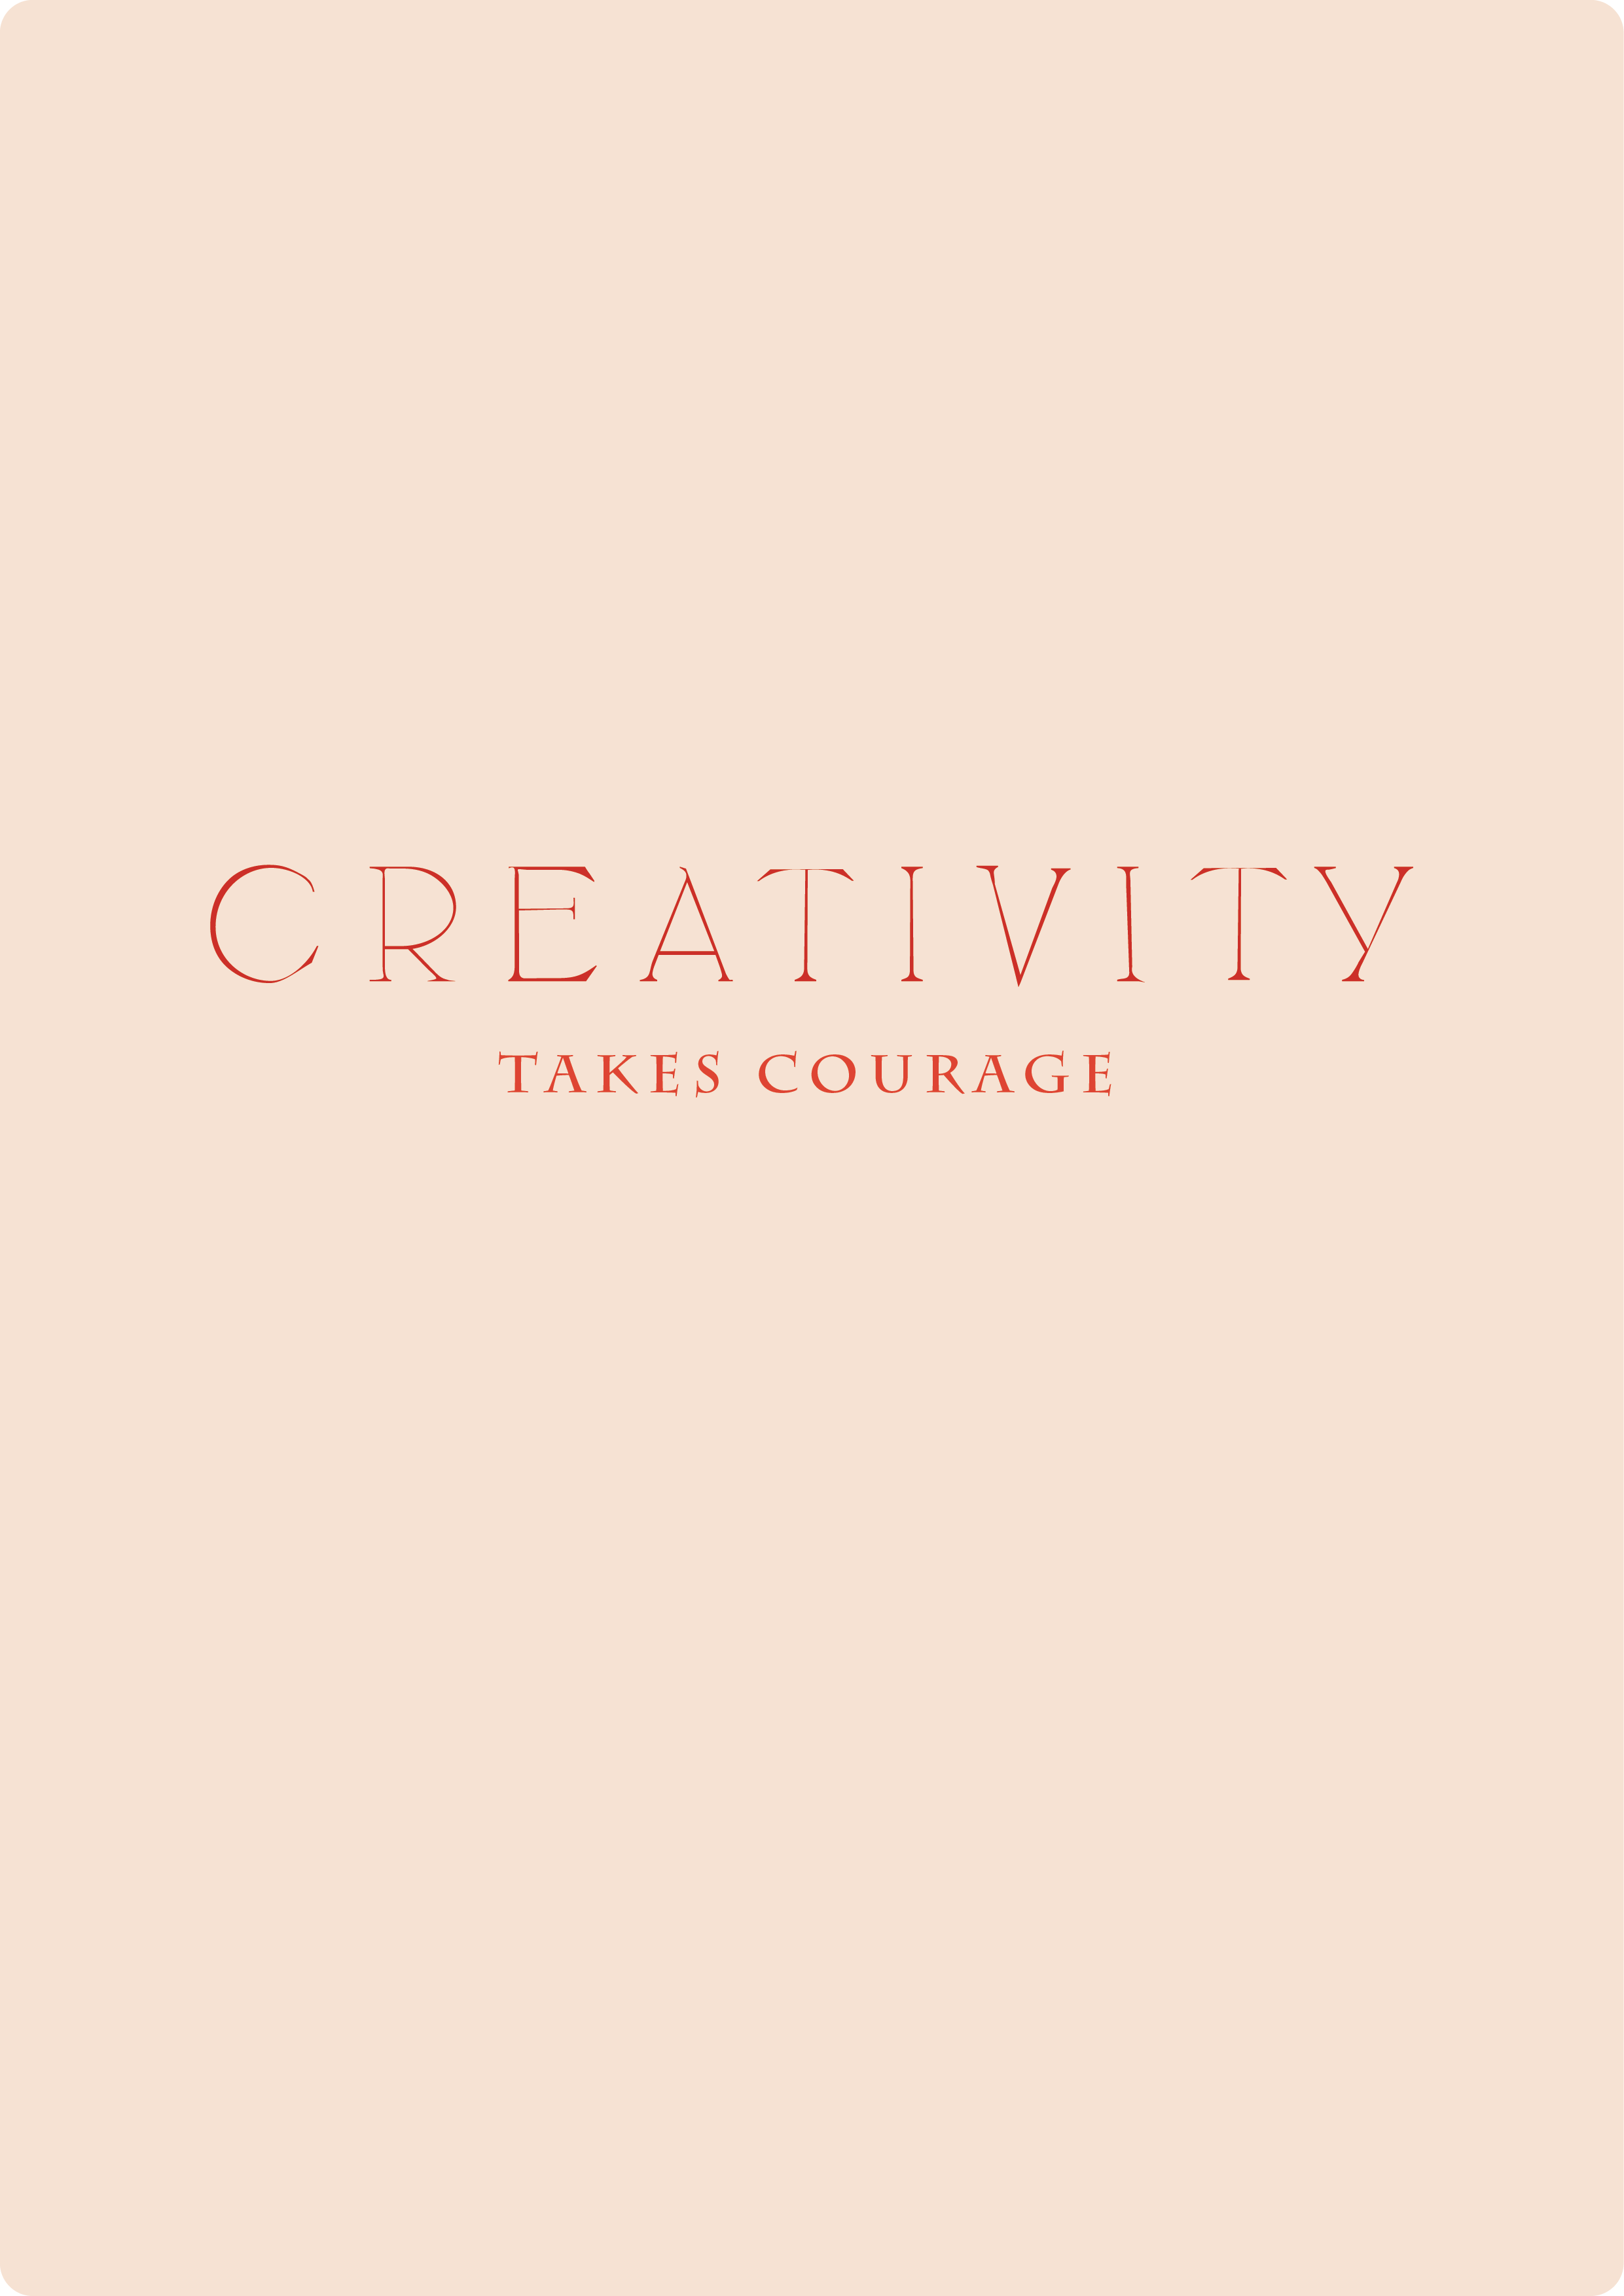 creativity takes courage // phylleli design blog and studio